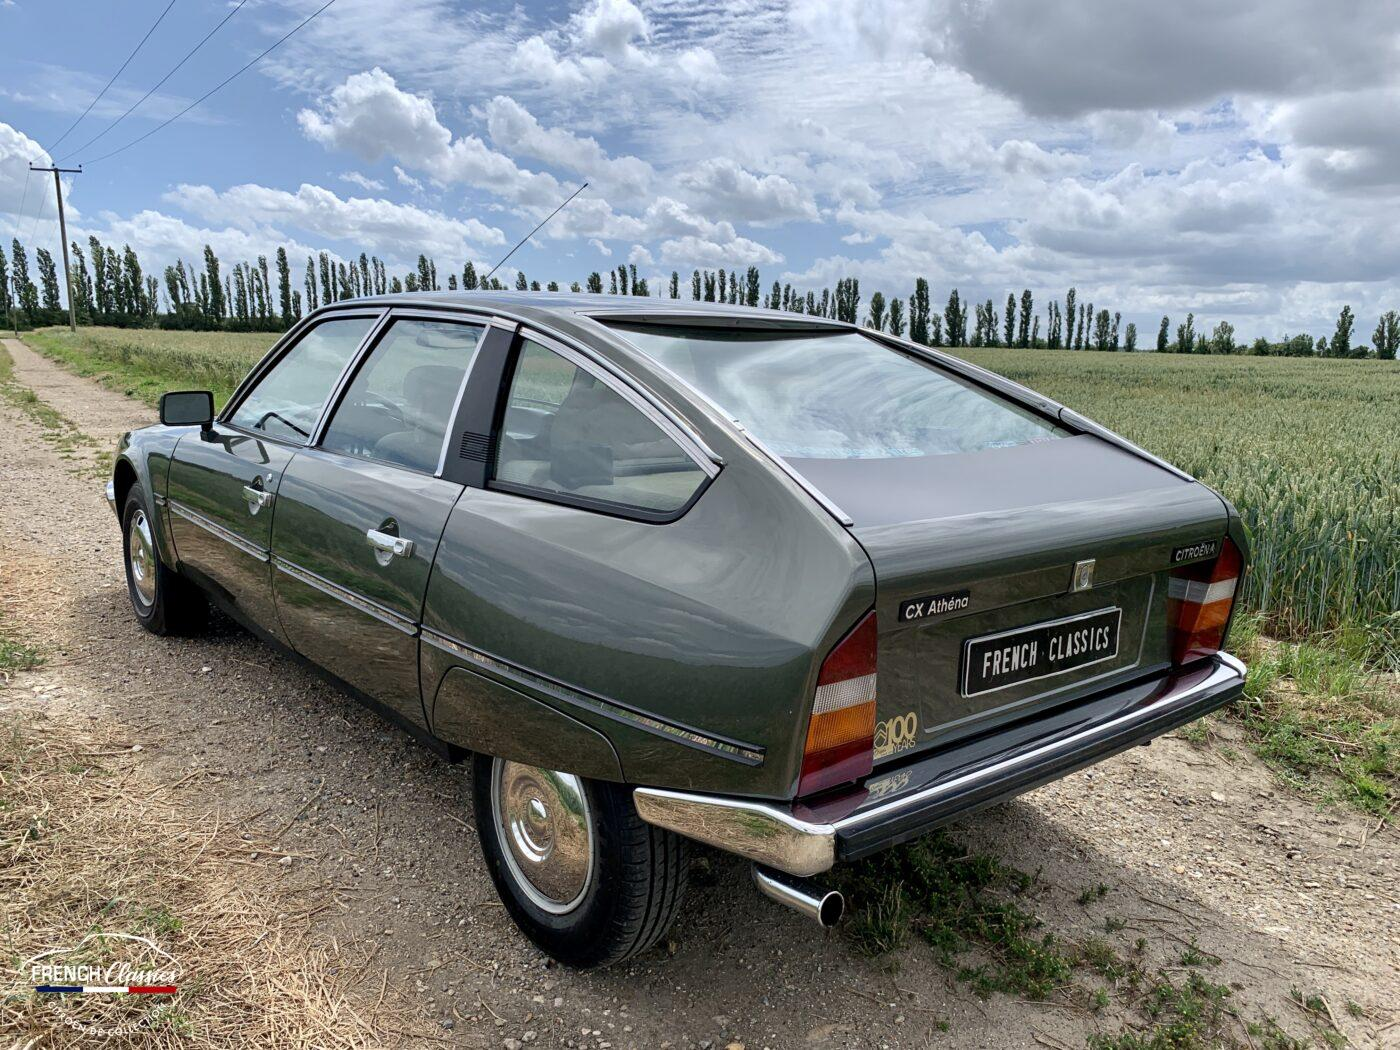 French Diesel: 1979 Citroën CX 2500 Pallas - Barn Finds